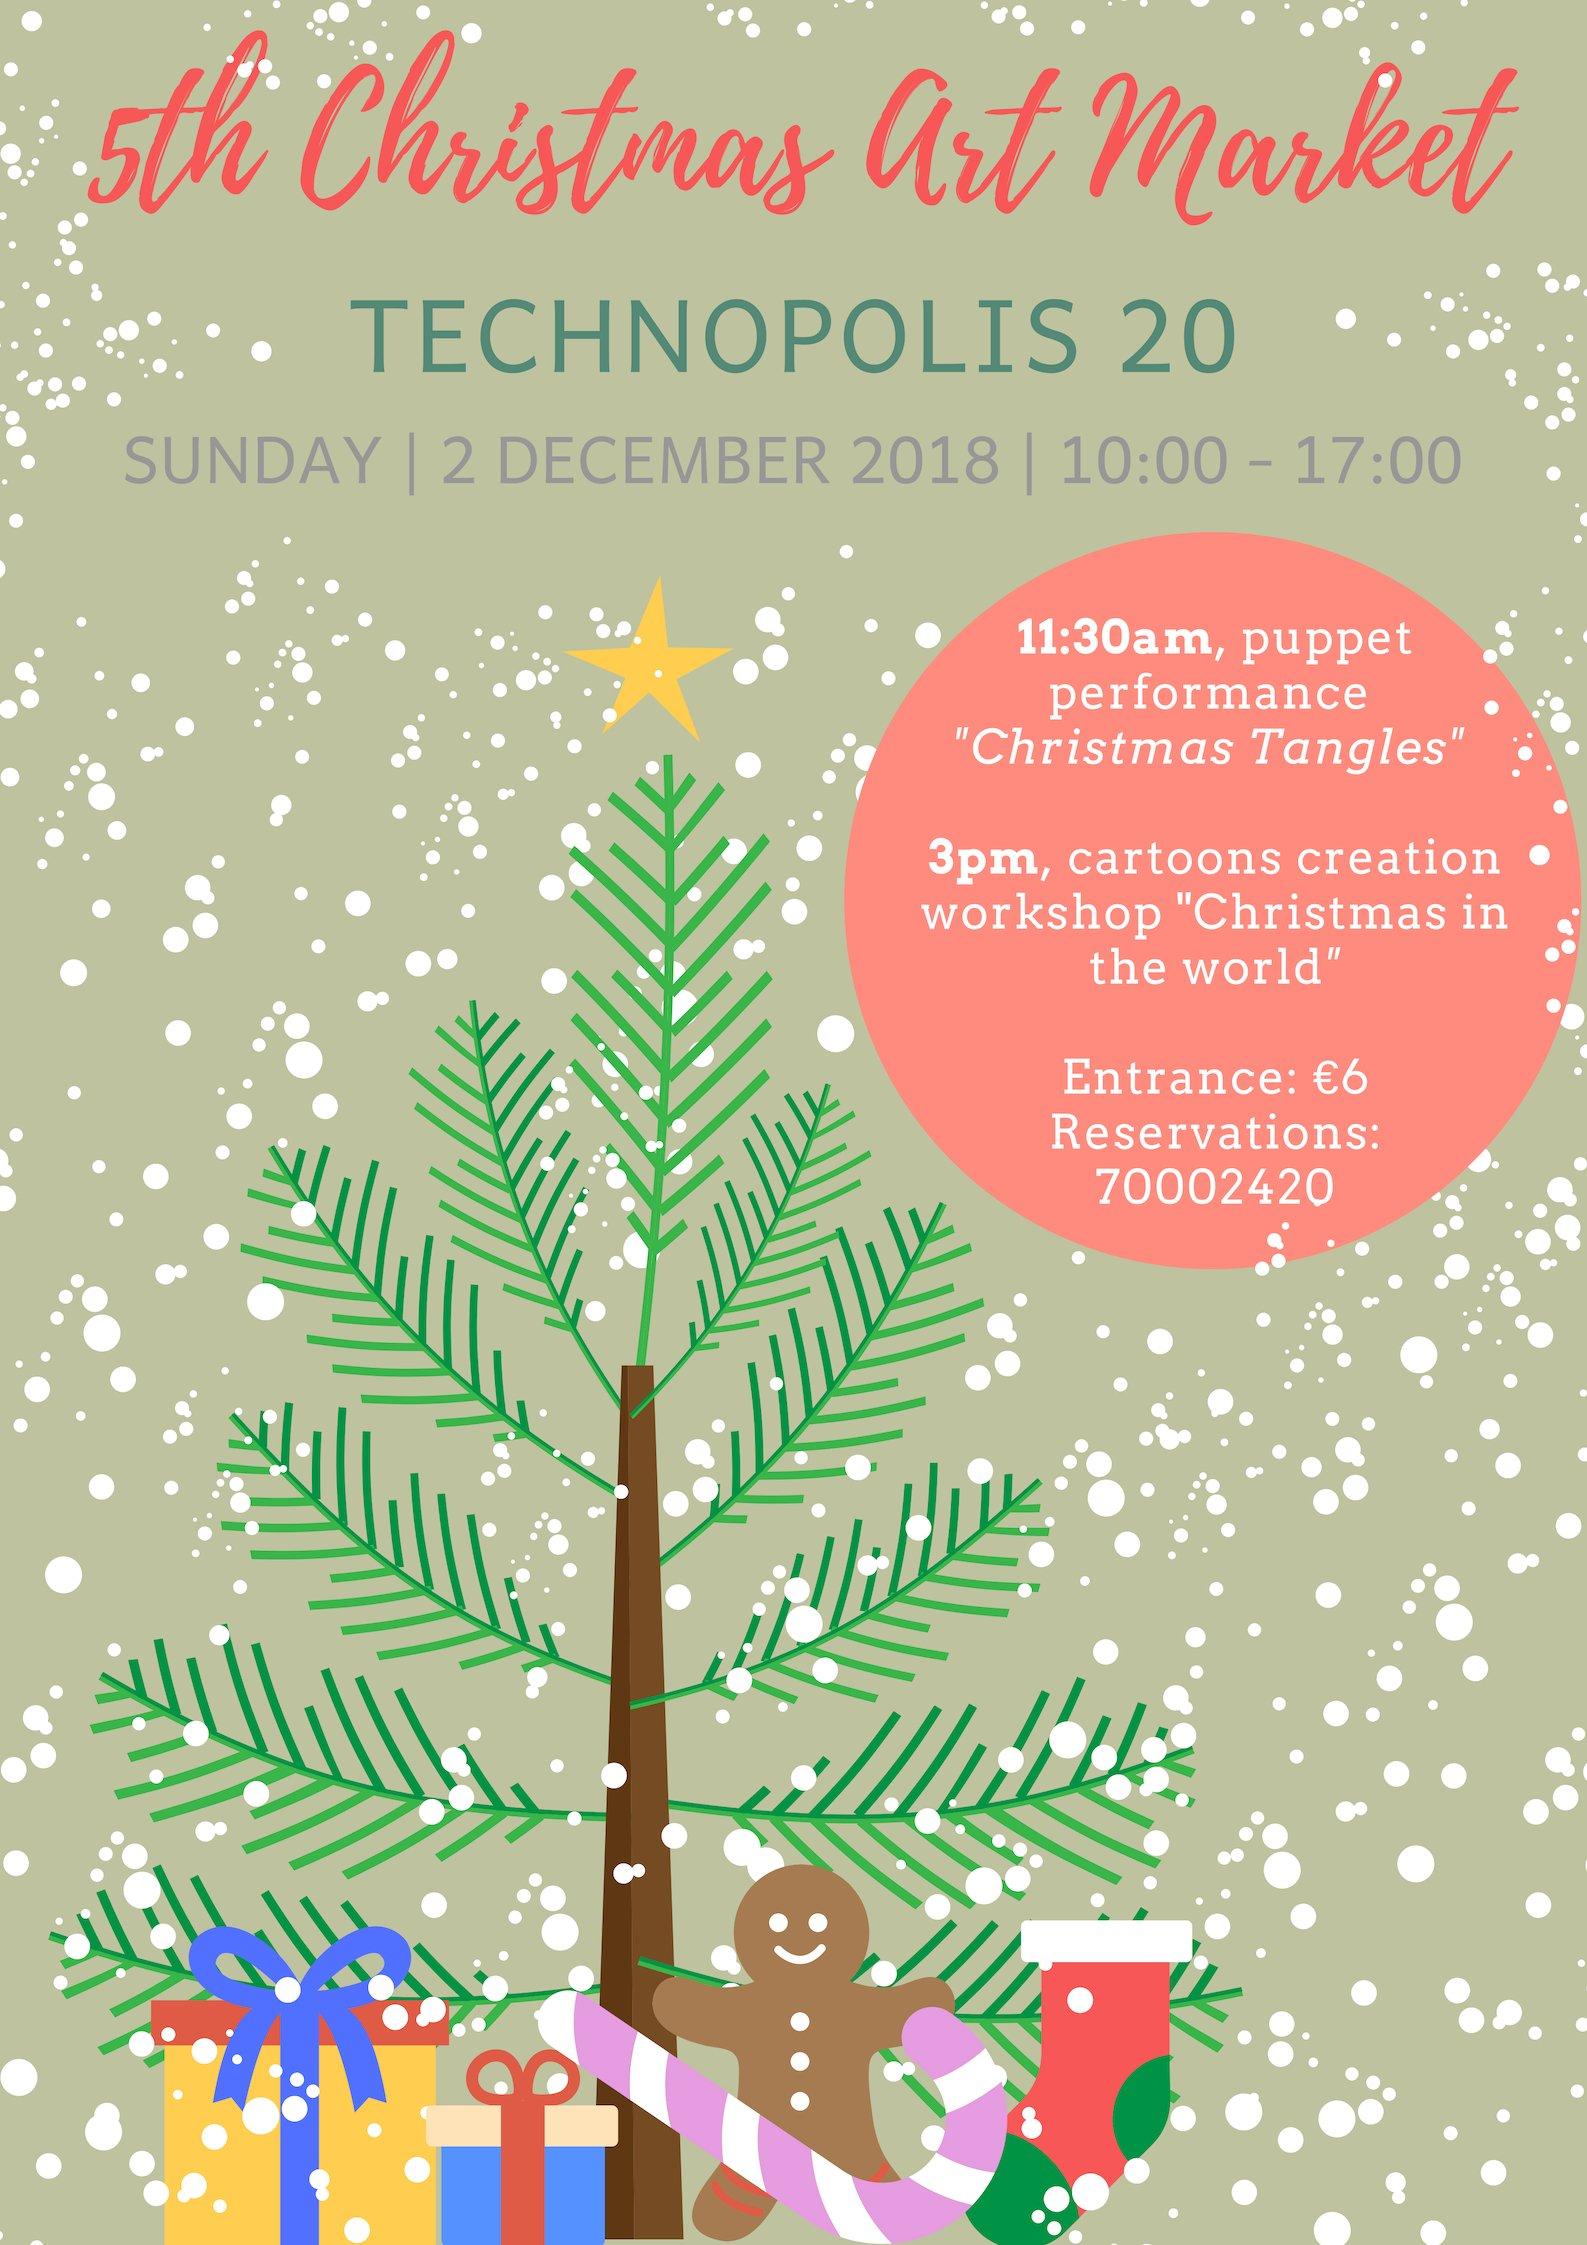 Technopolis 20 '5th Christmas Art Market